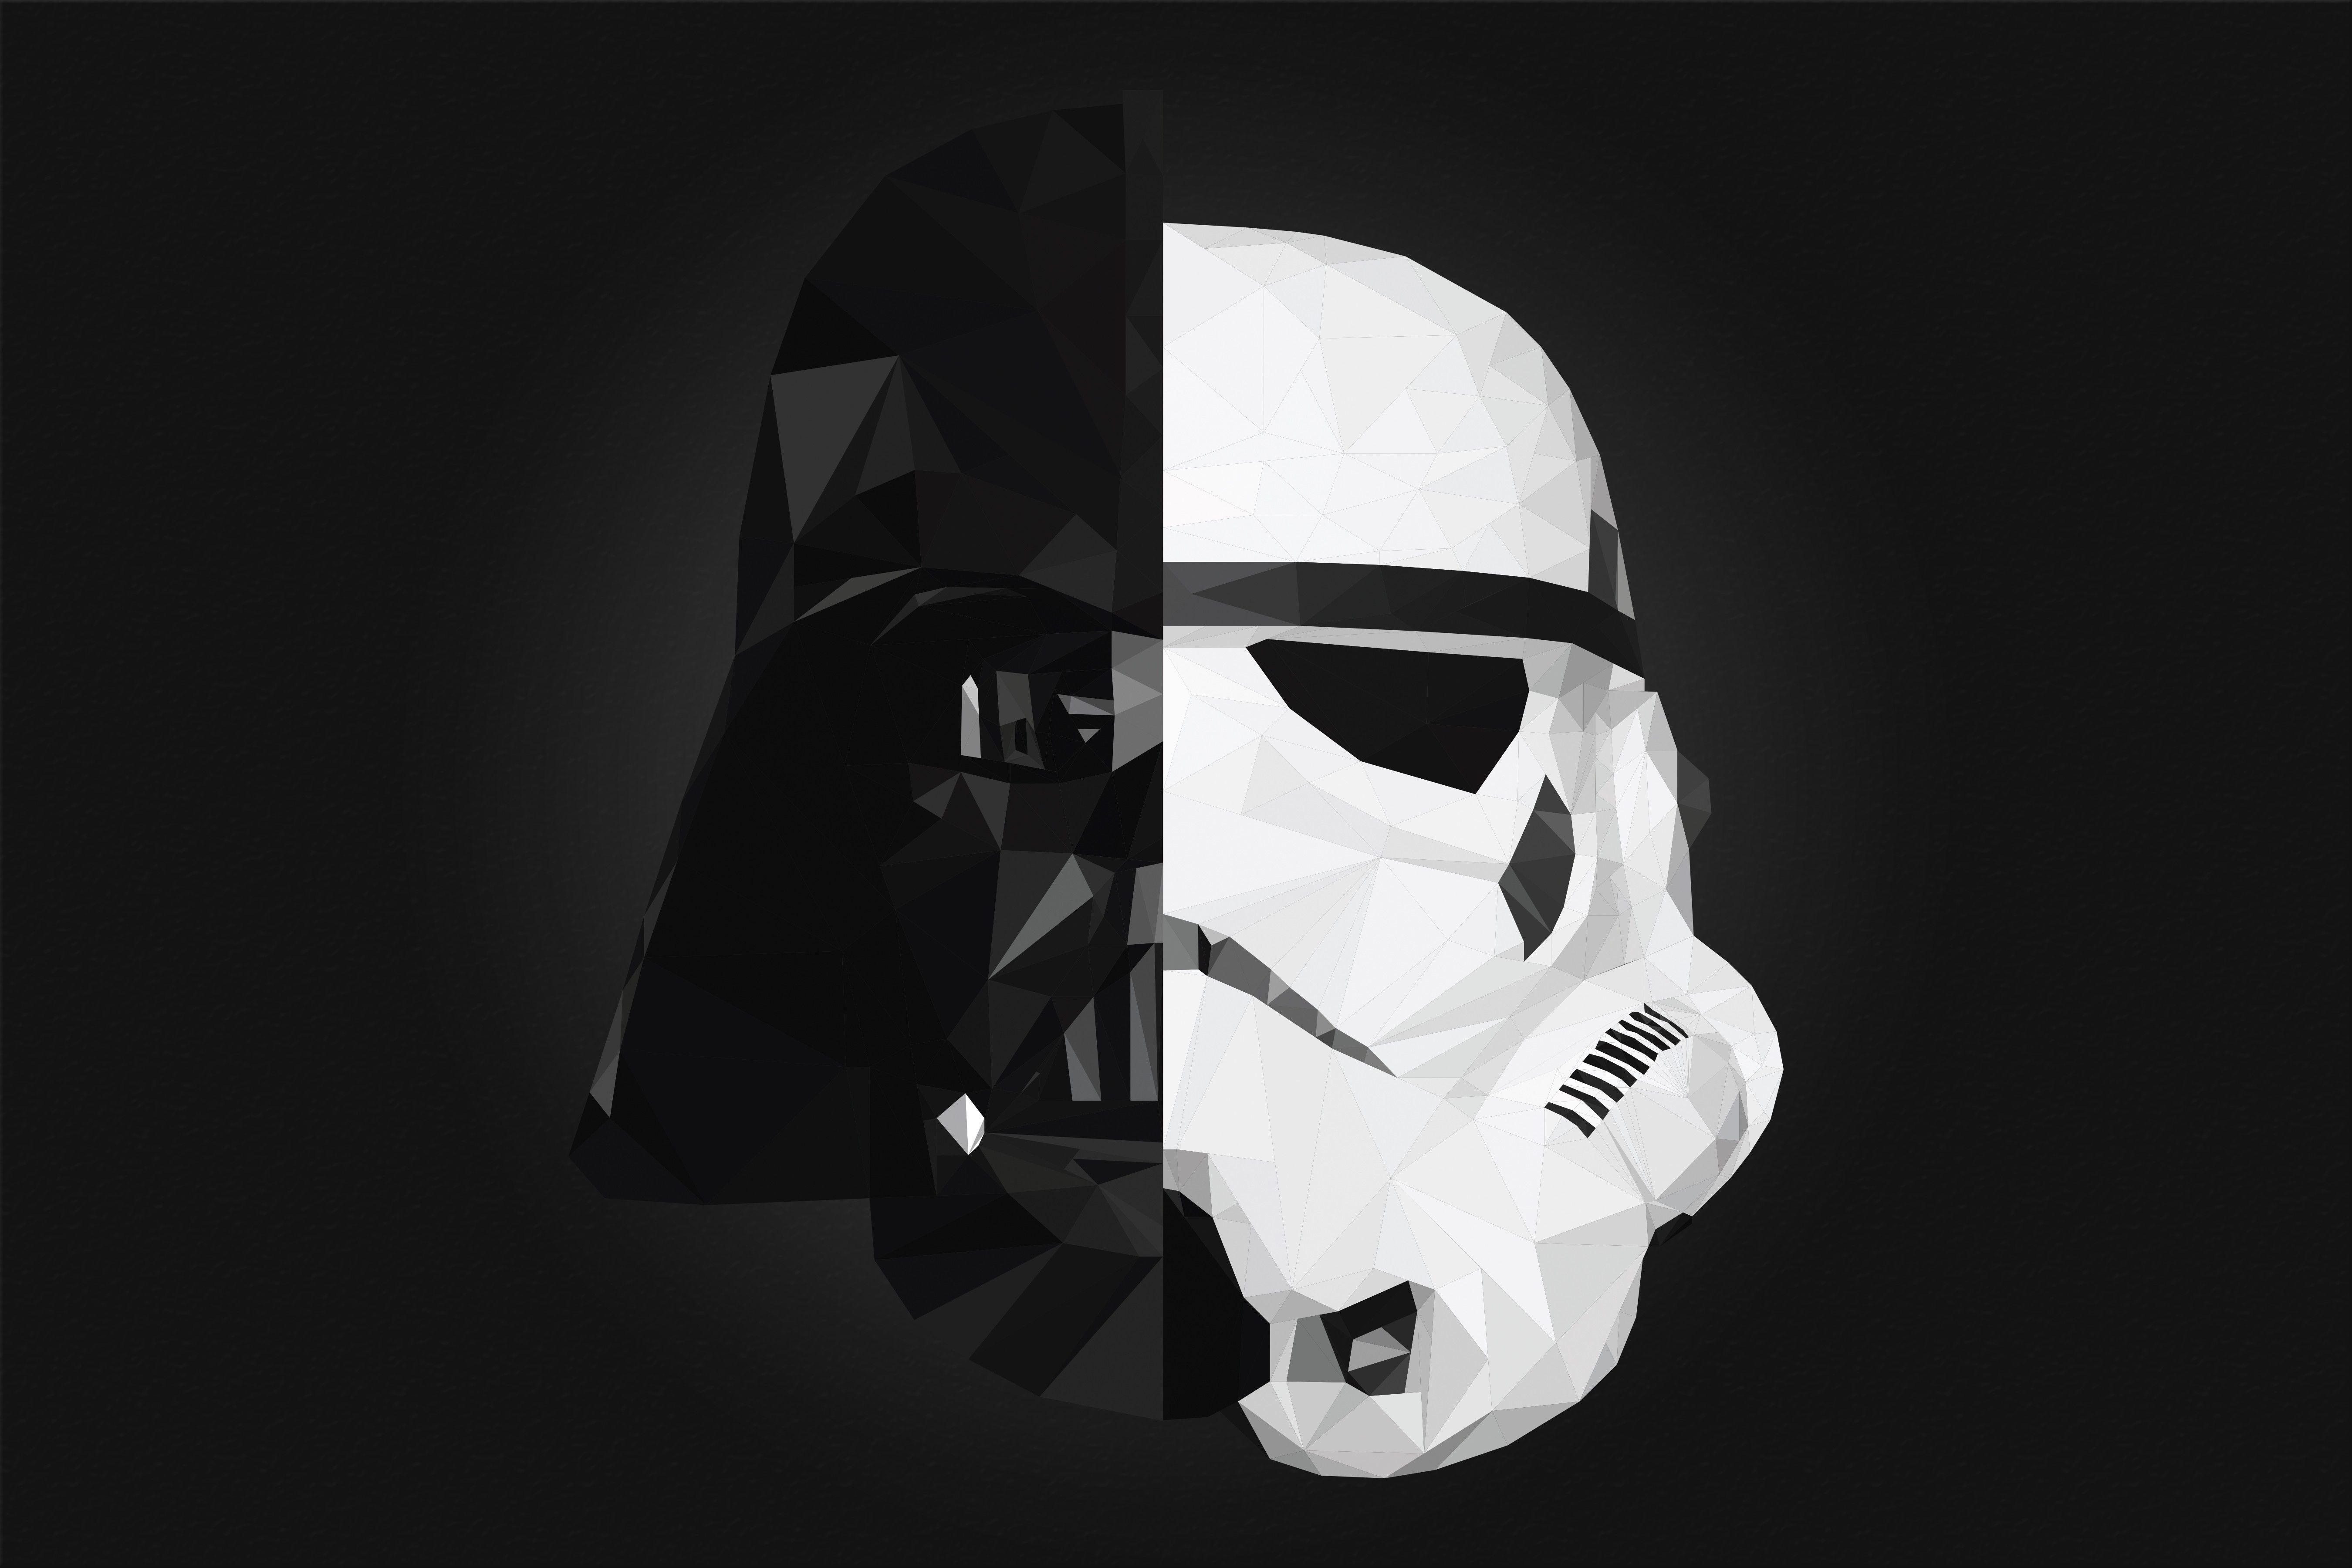 Darth Vader Stormtrooper Star Wars Low Poly Splitting Wallpaper No 1811 Star Wars Characters Wallpaper Dual Monitor Wallpaper Darth Vader Wallpaper